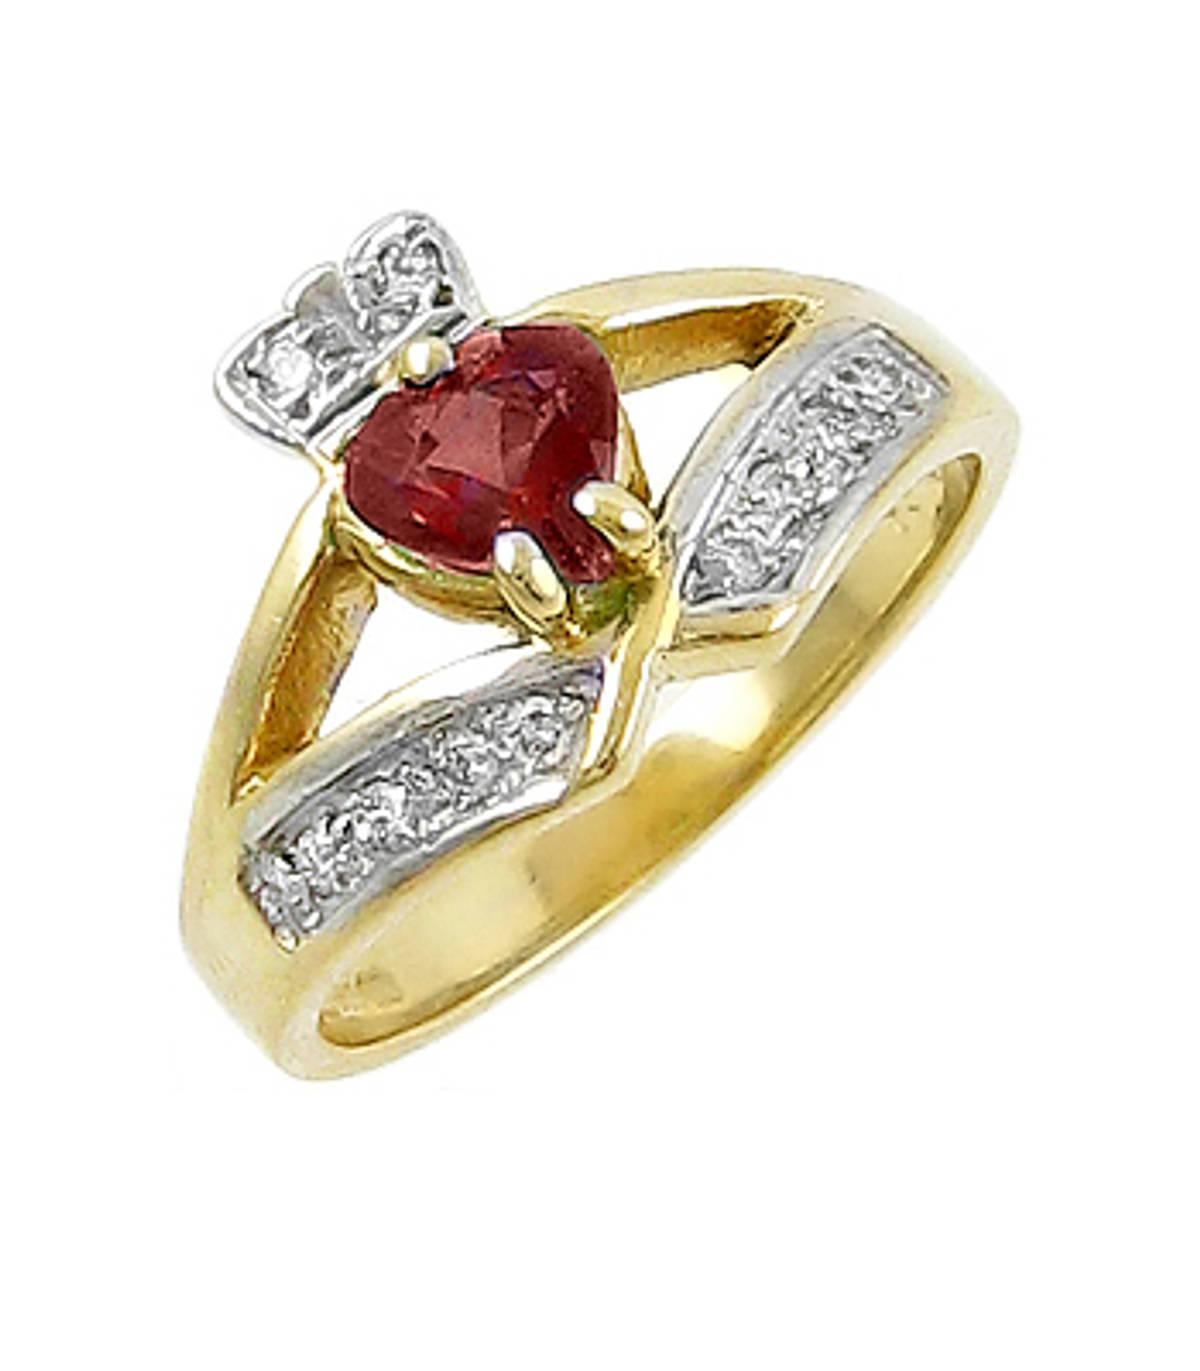 14 carat yellow gold 0.55cts garnet/0.12cts diamonds claddagh engagement ring